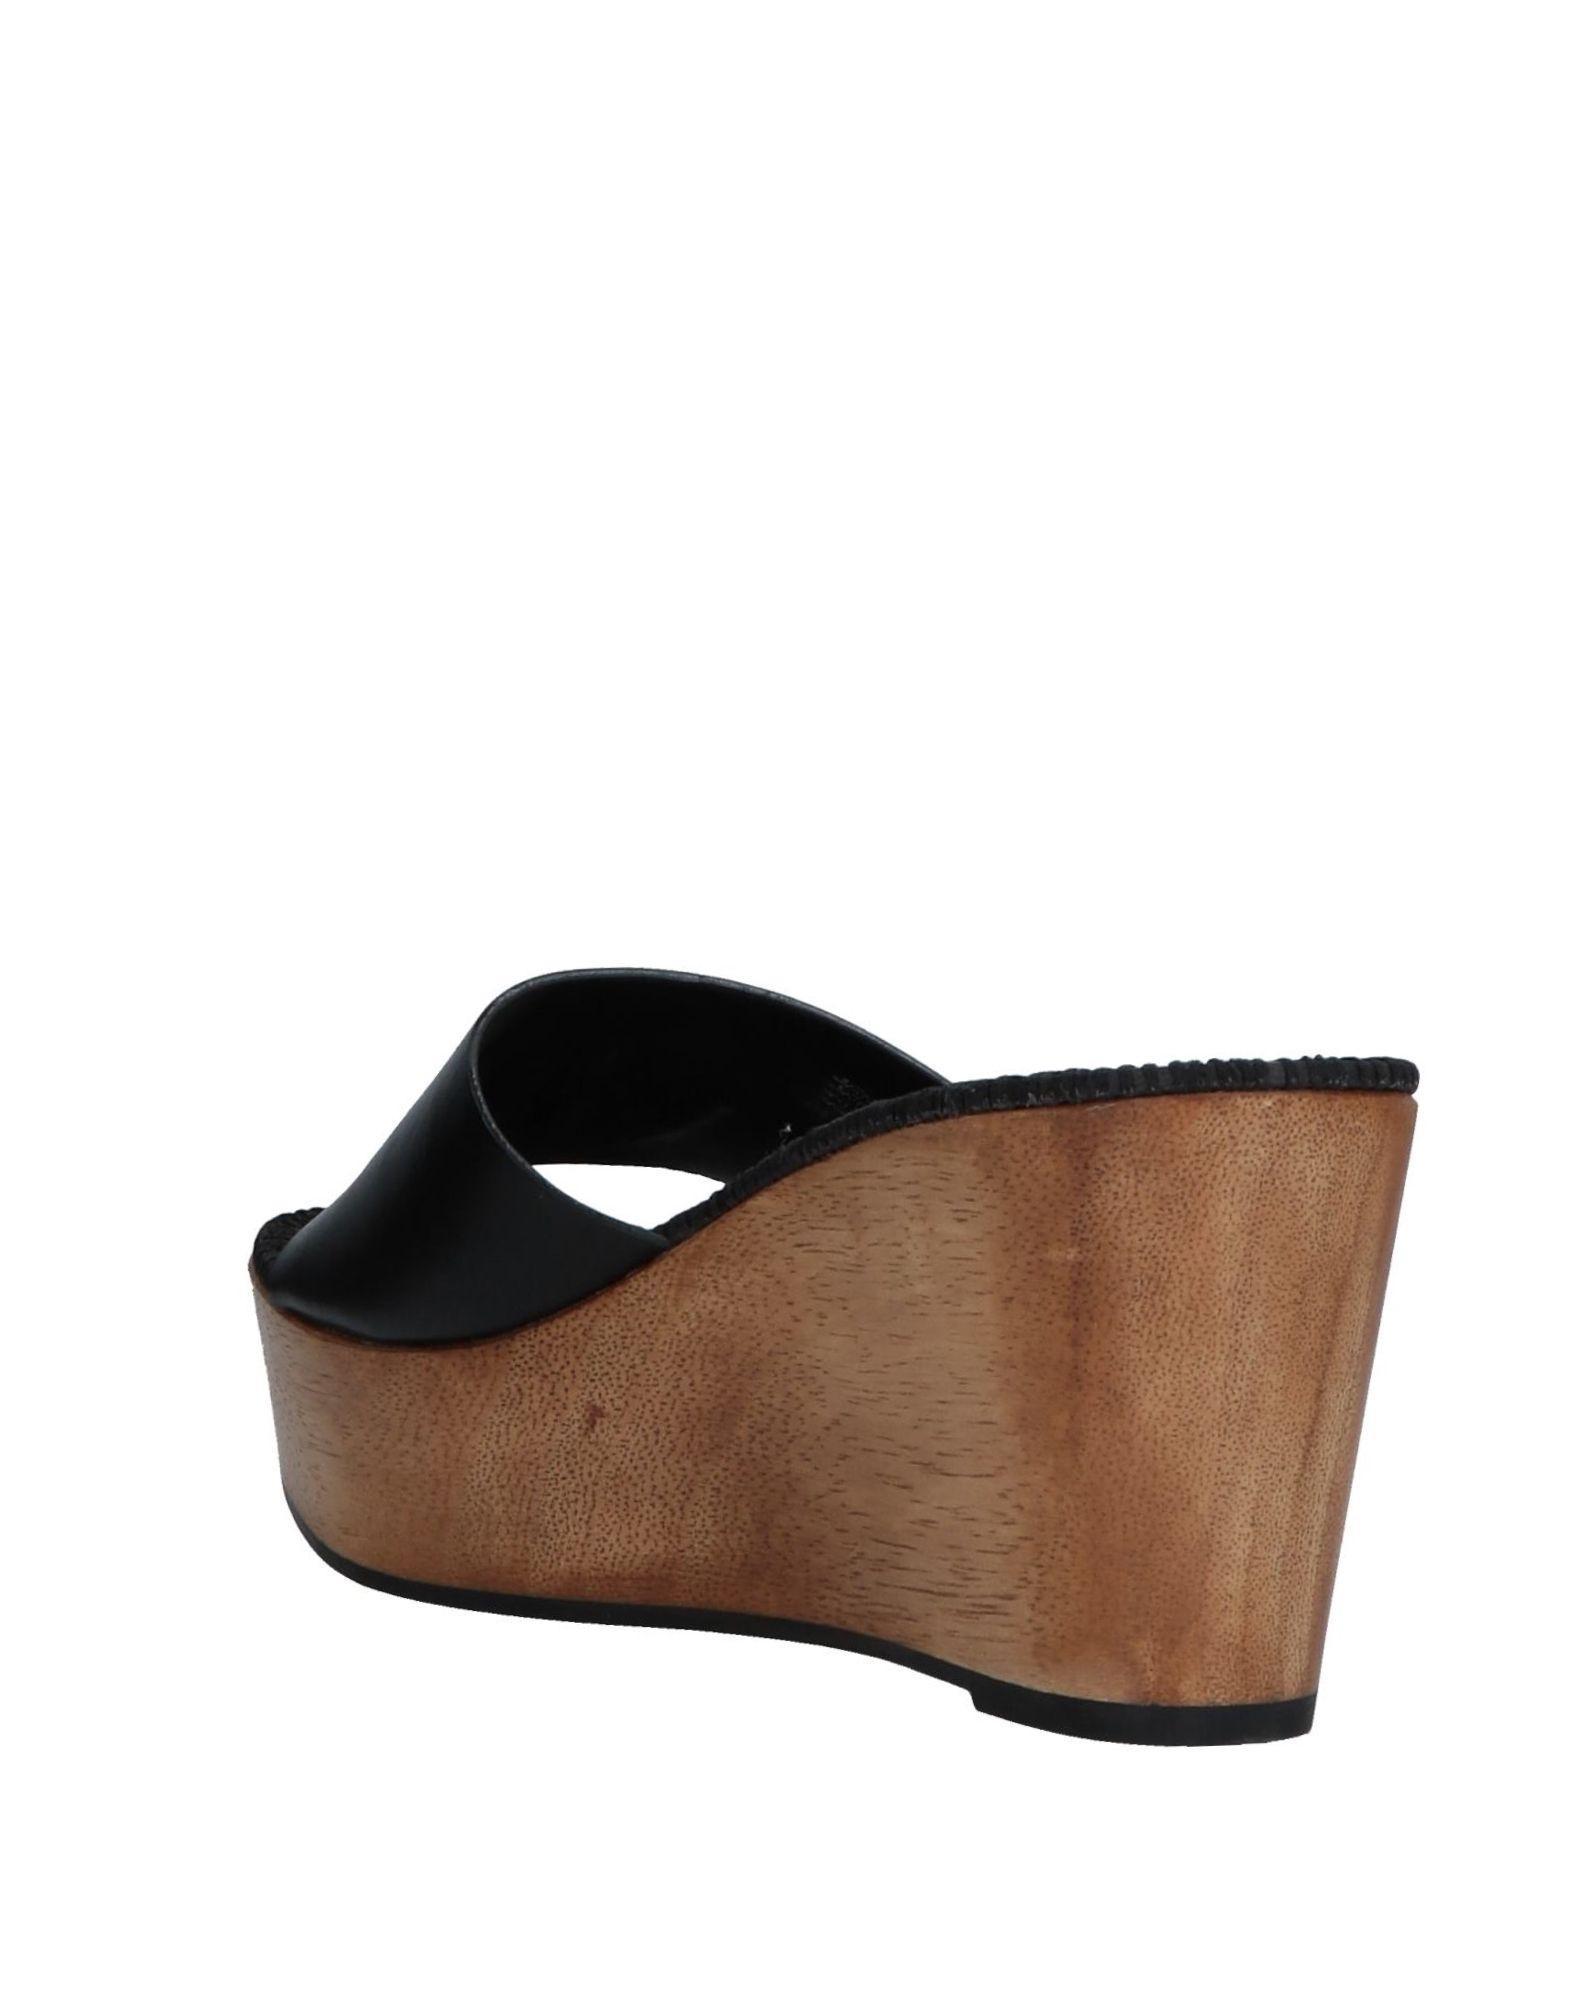 c6b2bc632dfb Lyst - Tory Burch Sandals in Black - Save 48%